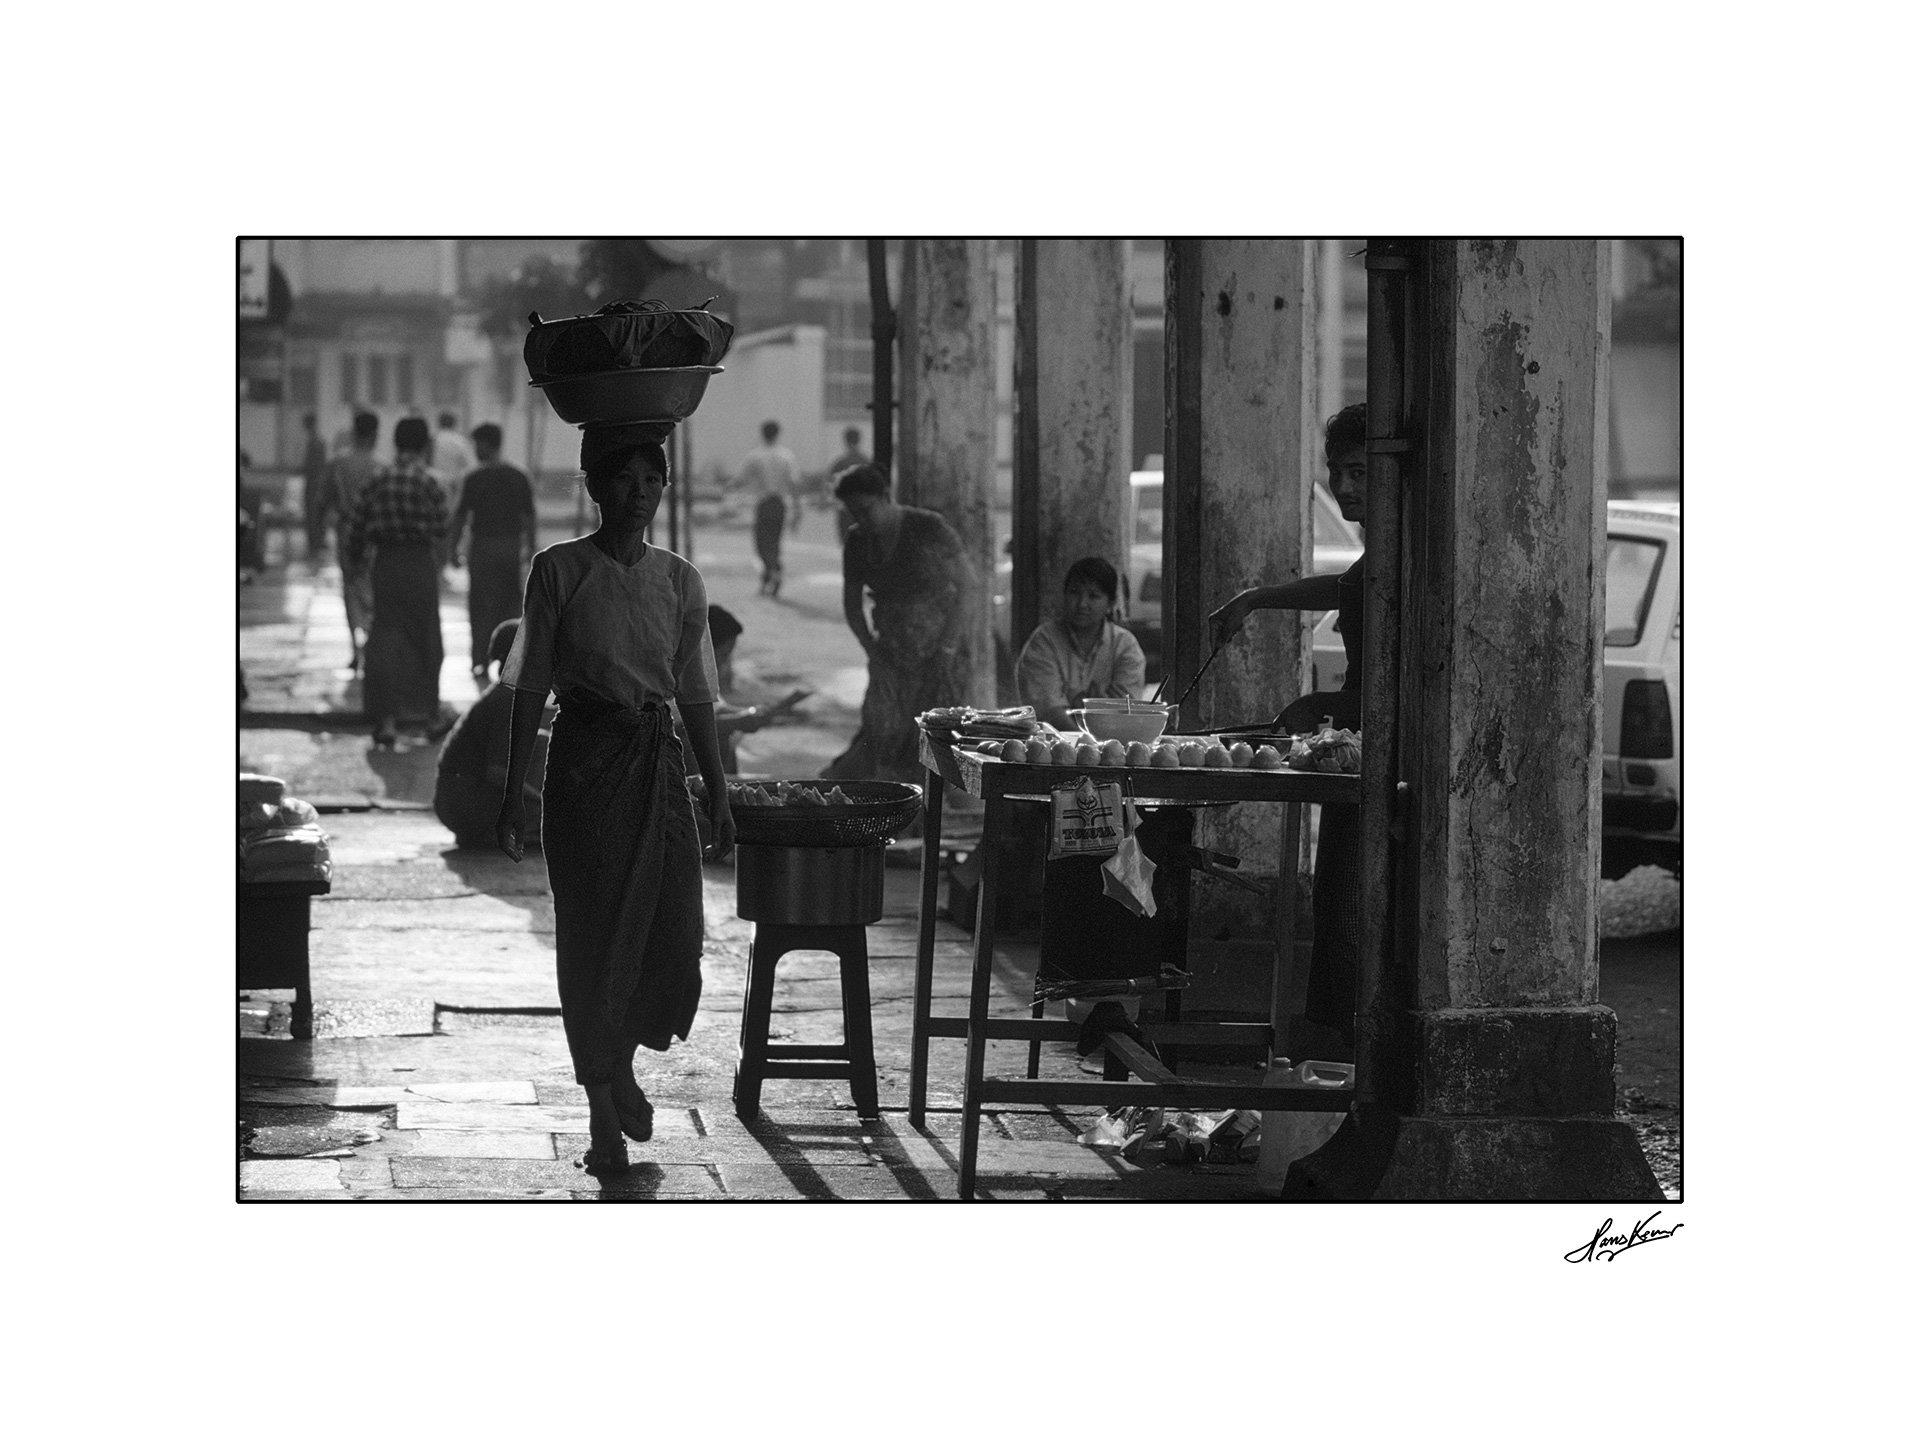 Yangon sidewalk, Myanmar, 2001